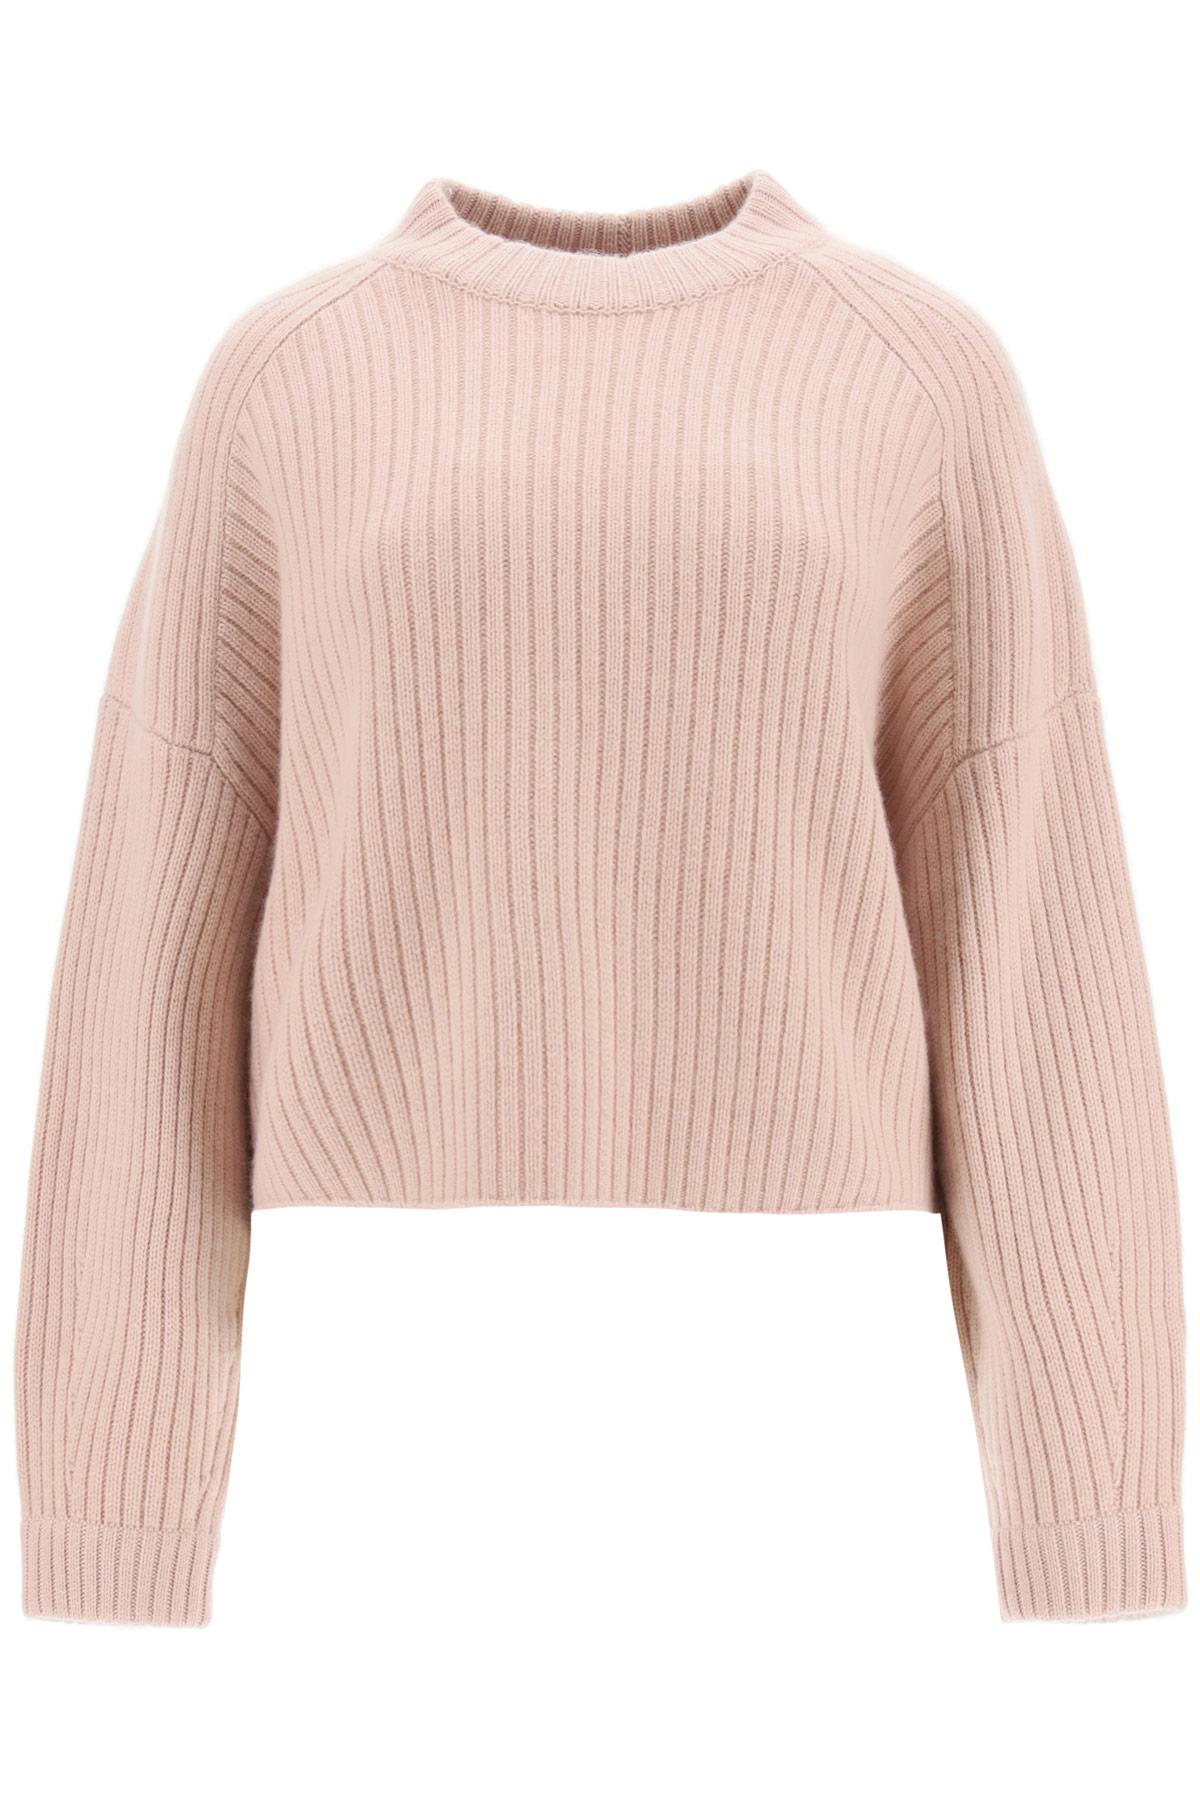 LE KASHA MACAO CASHMERE SWEATER OS Pink Cashmere